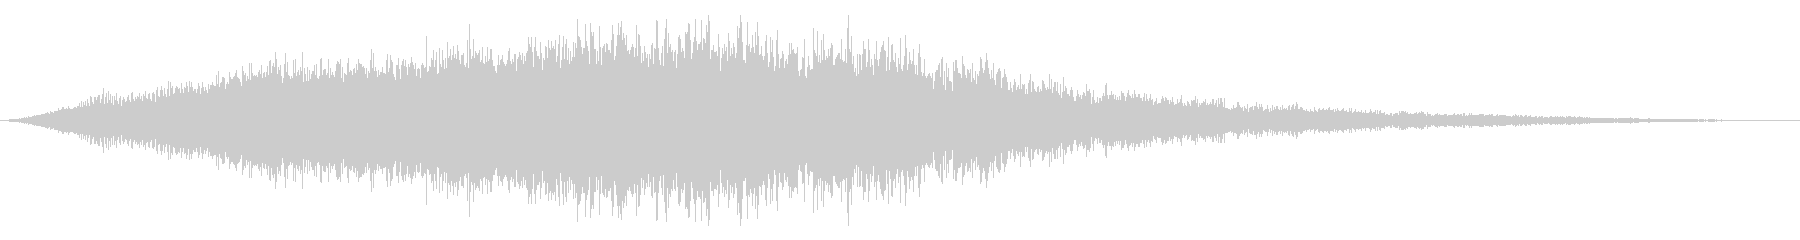 ALIEN CHORD 2持続変調コードの未再生の波形